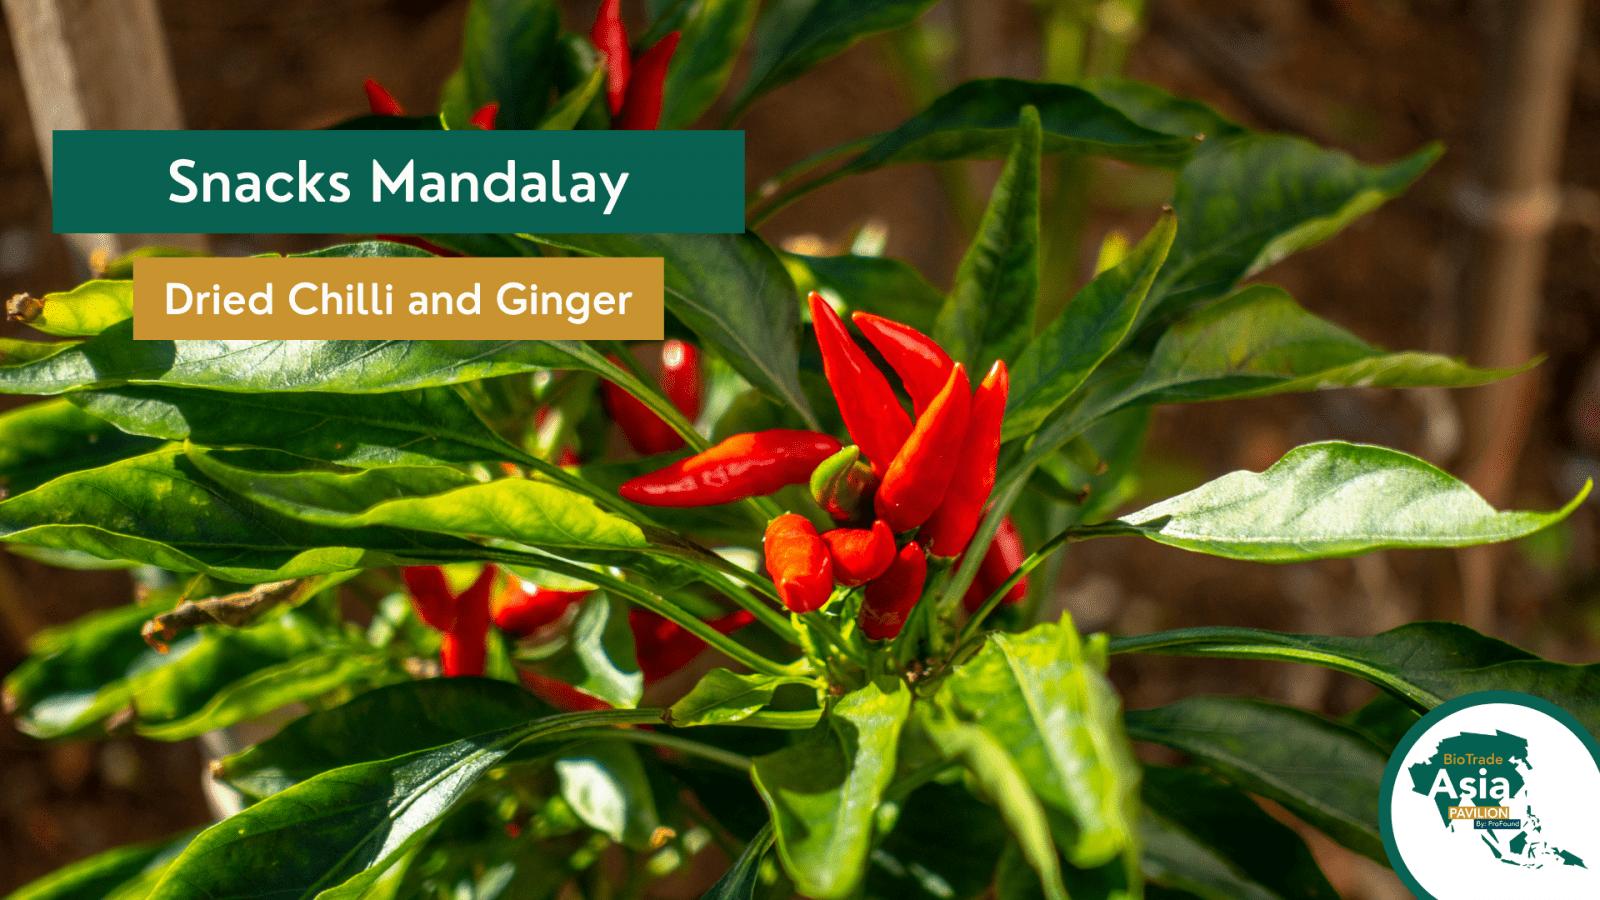 Snacks Mandalay Chilli (2)